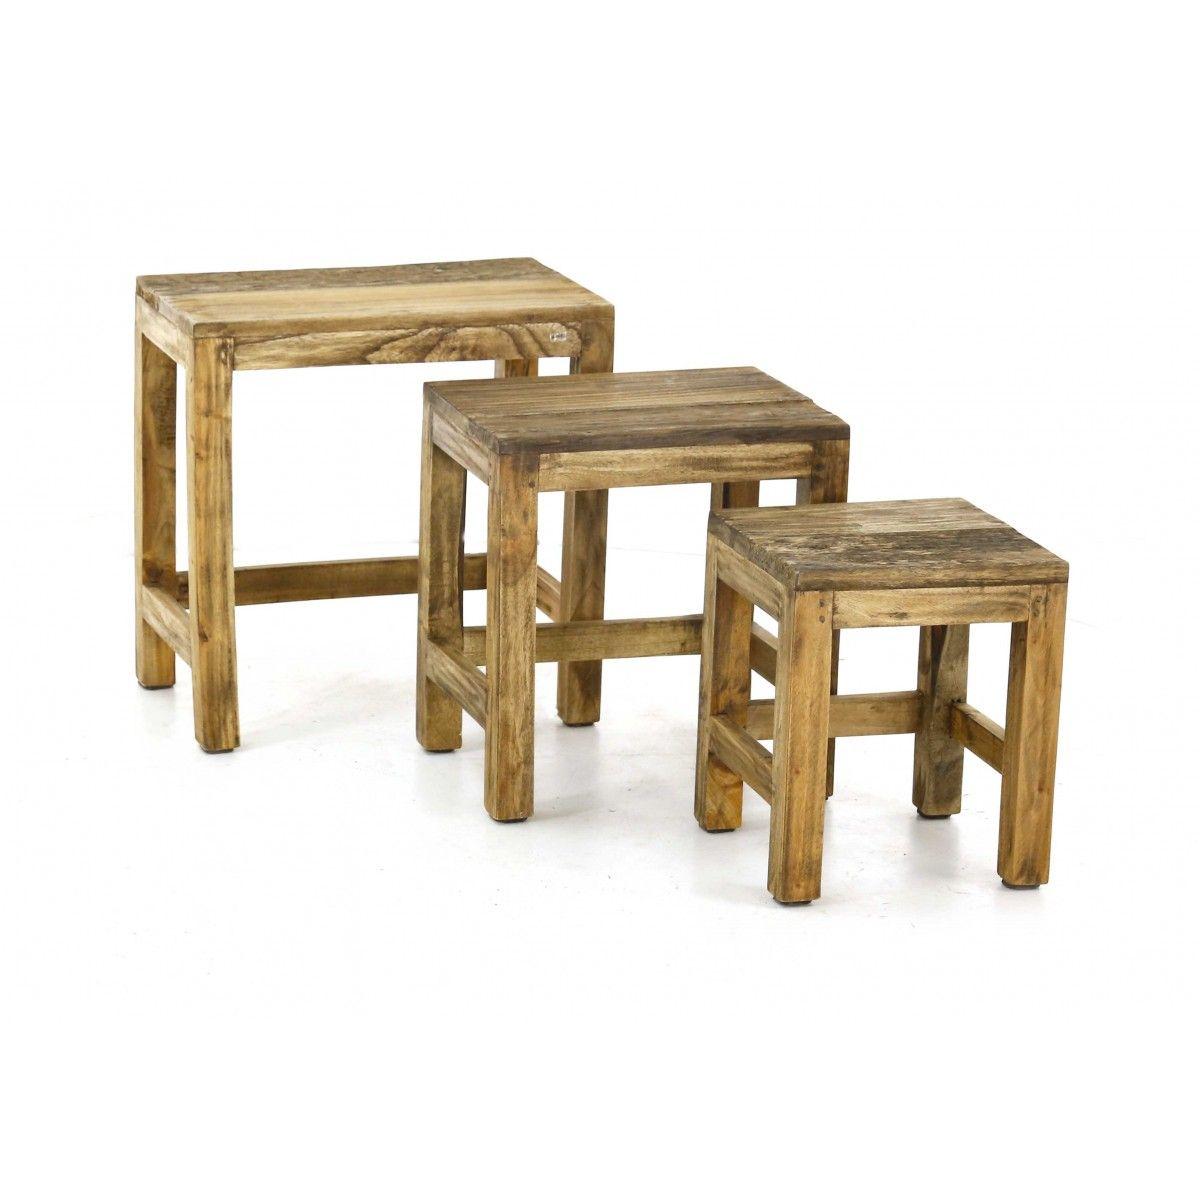 tables basses gigognes table basse bois recycl table basse rustique tables basses en pin et. Black Bedroom Furniture Sets. Home Design Ideas